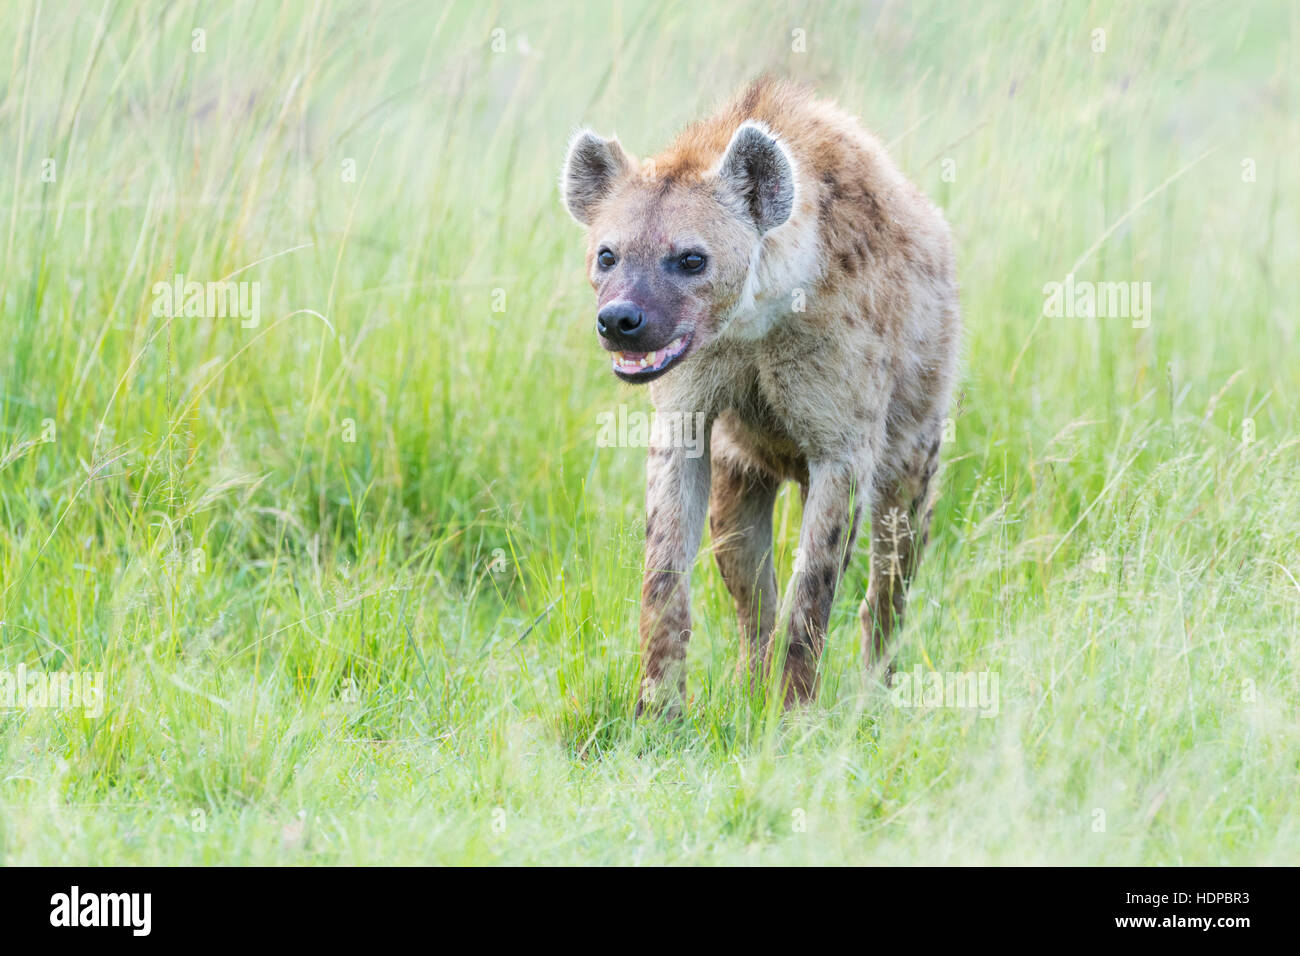 L'Hyène tachetée (Crocuta crocuta) sur la savane, Maasai Mara National Reserve, Kenya Photo Stock